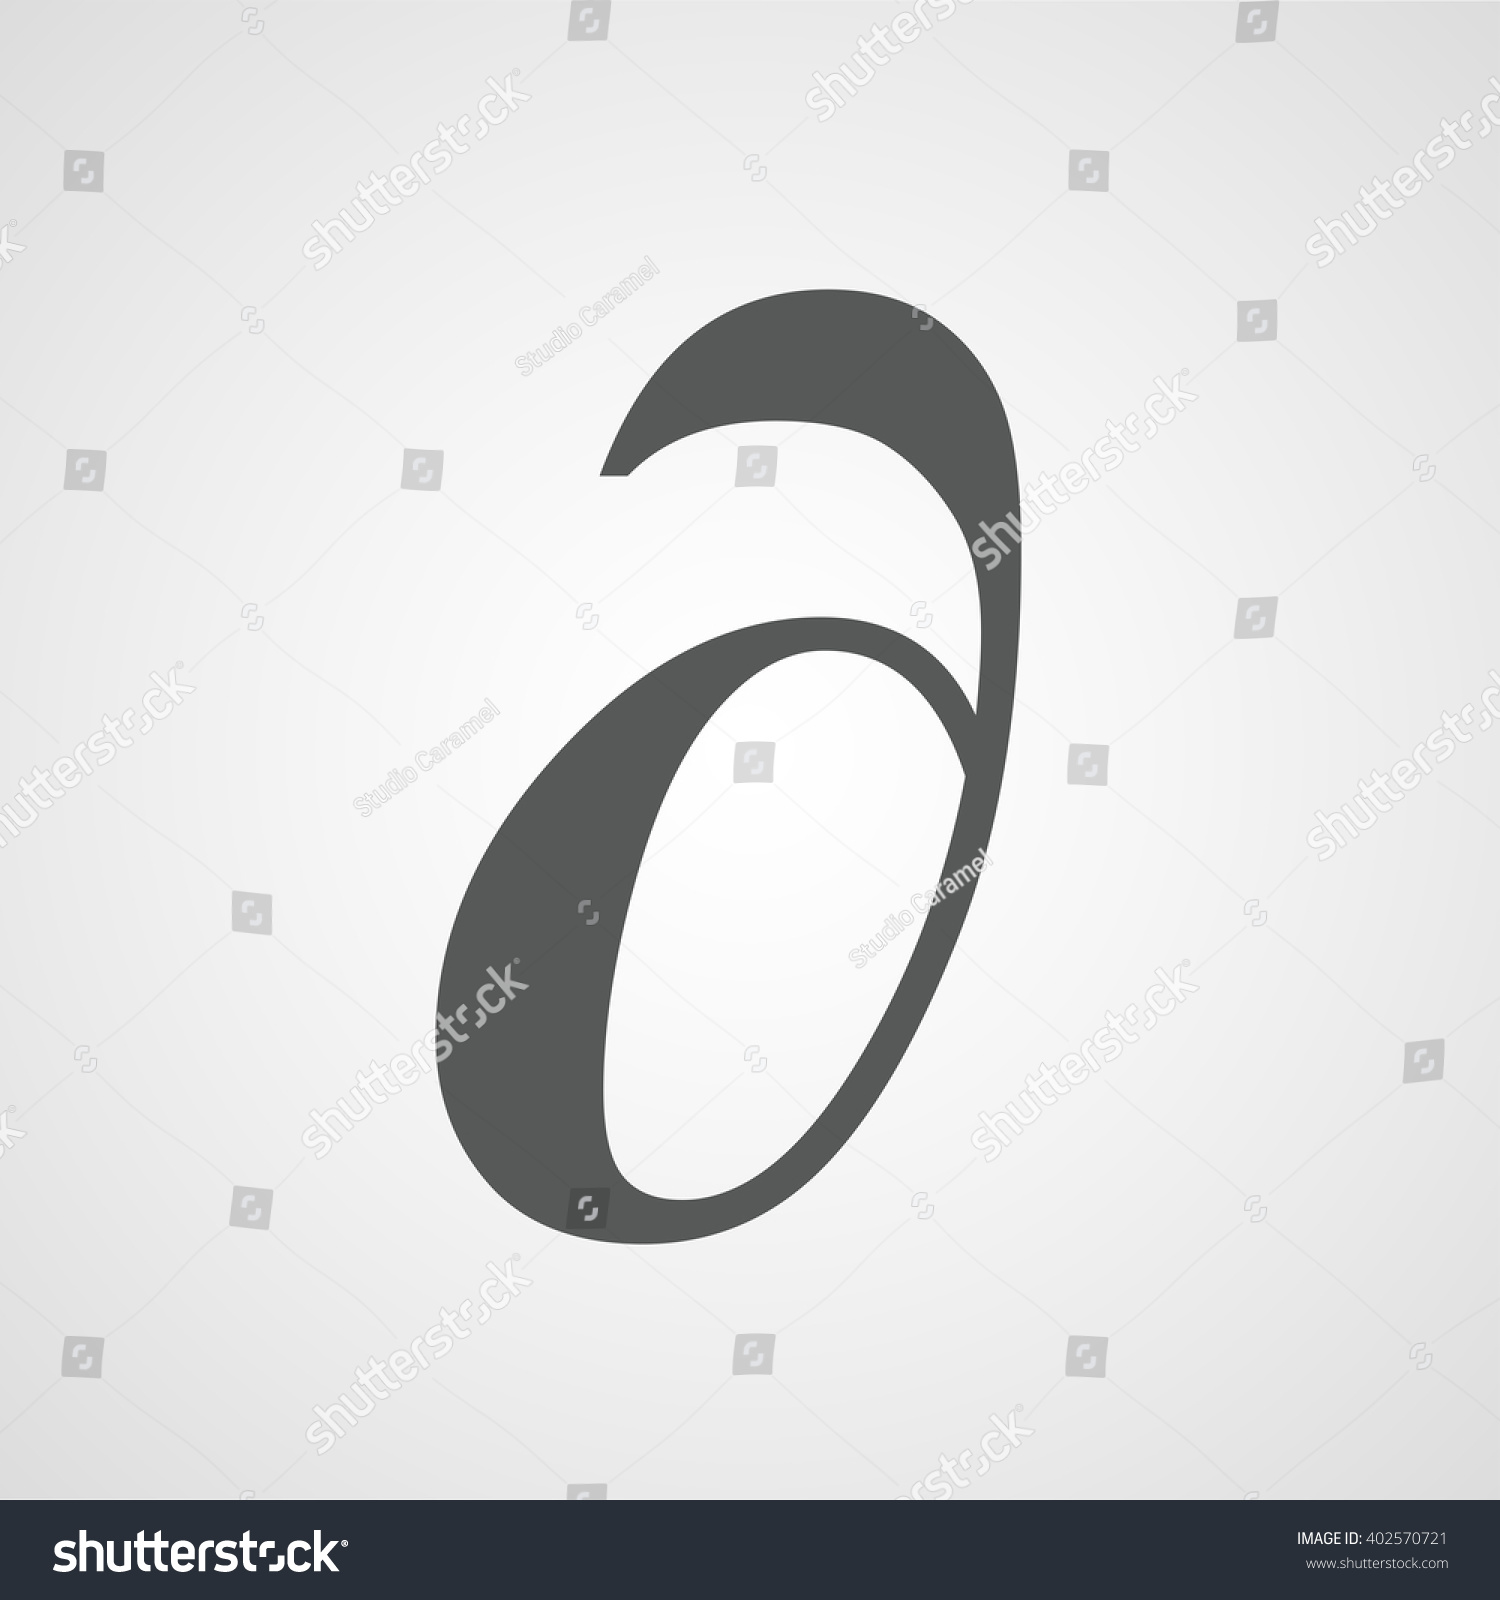 Delta icon latin letter vector symbol stock vector 402570721 delta icon latin letter vector symbol biocorpaavc Choice Image